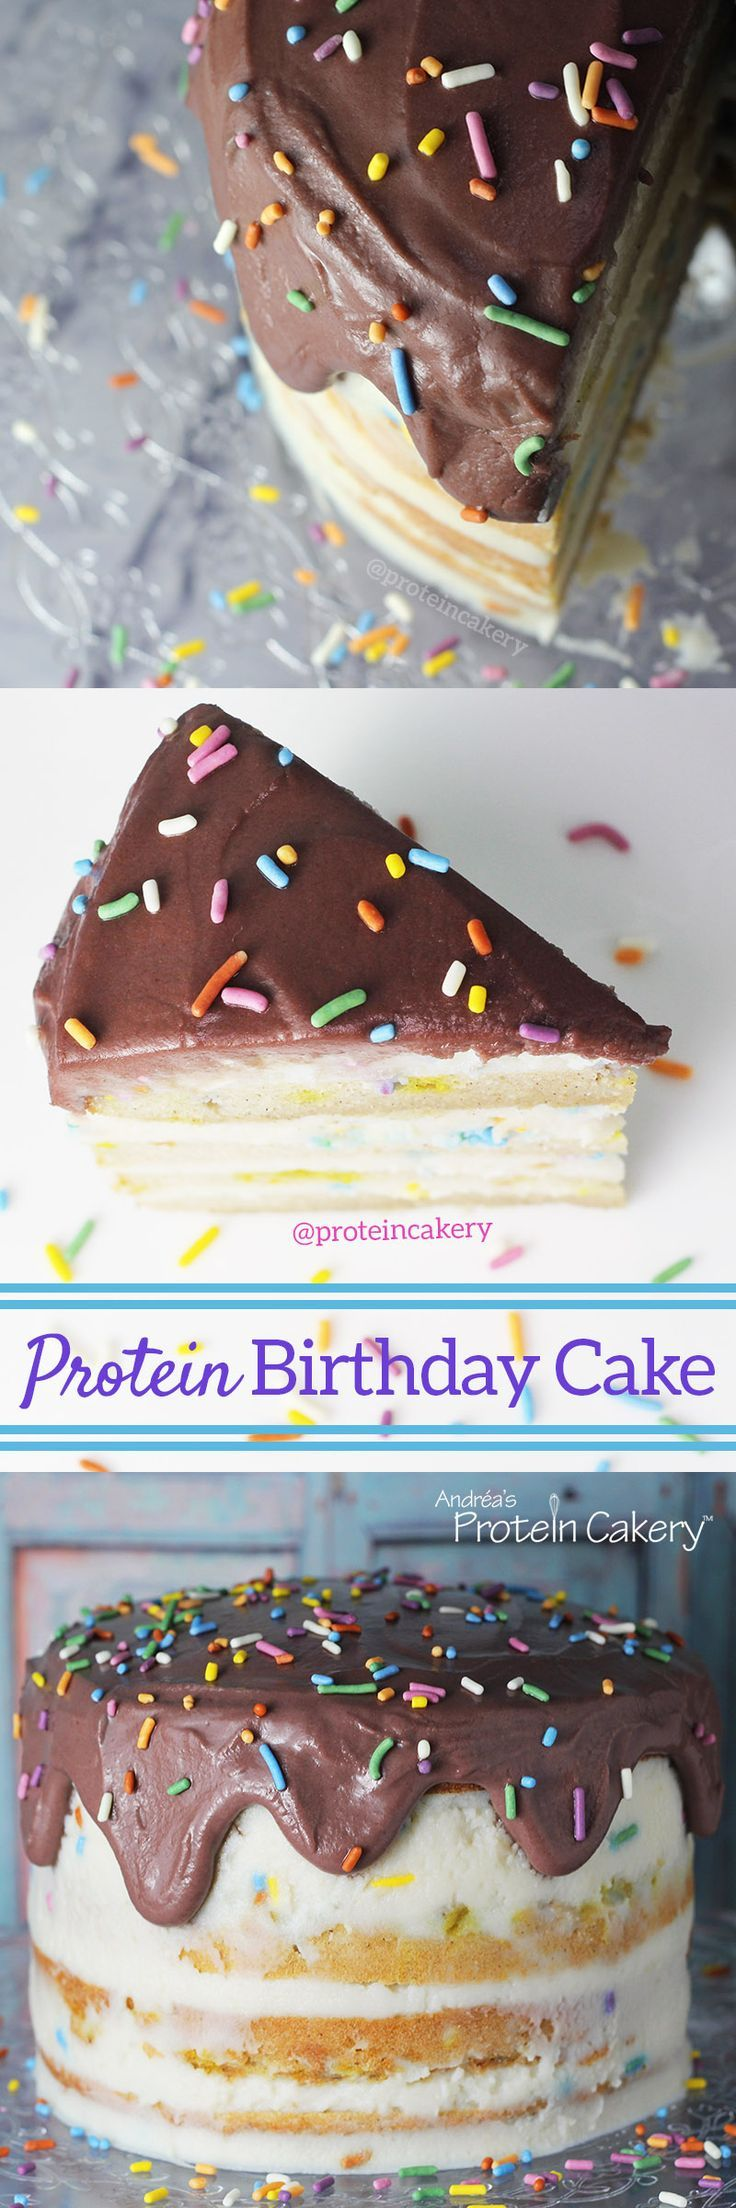 Surprising Protein Birthday Cake With All Natural Sprinkles Gluten Free Funny Birthday Cards Online Hendilapandamsfinfo